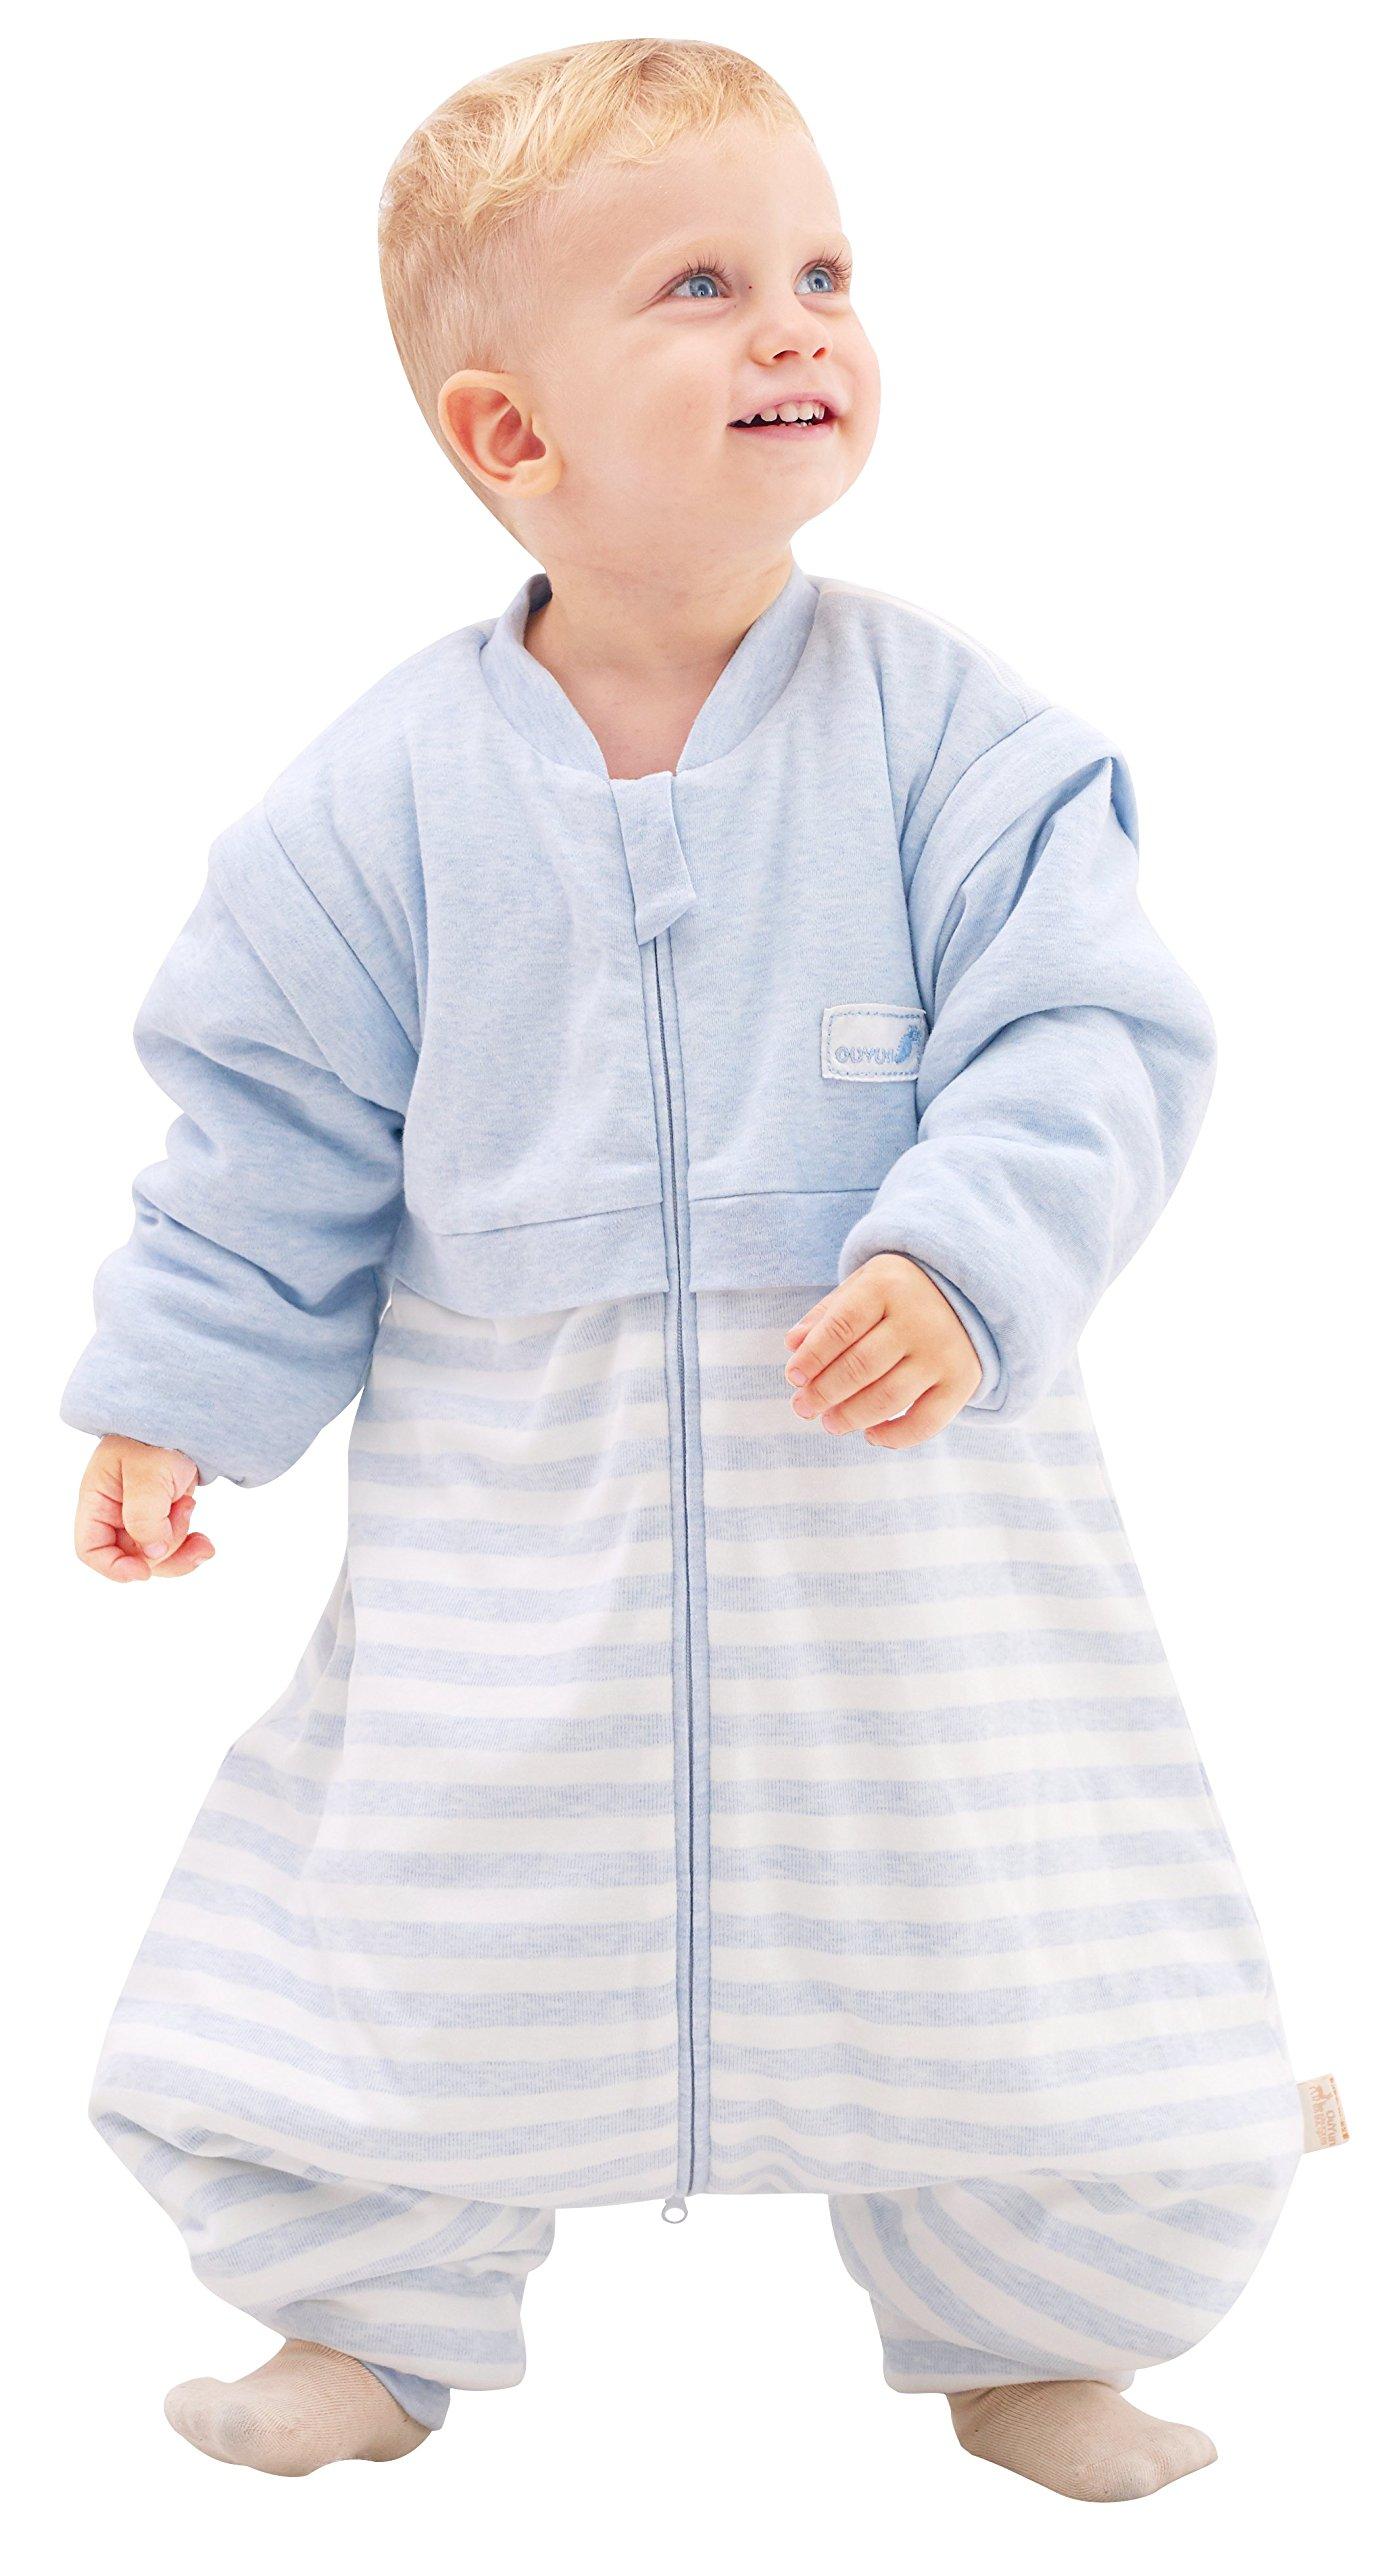 OuYun Baby Early Walker Sleeping Bag with Feet Detachable Sleeve Wearable Blanket Spring&Autumn, Blue, XX-Large